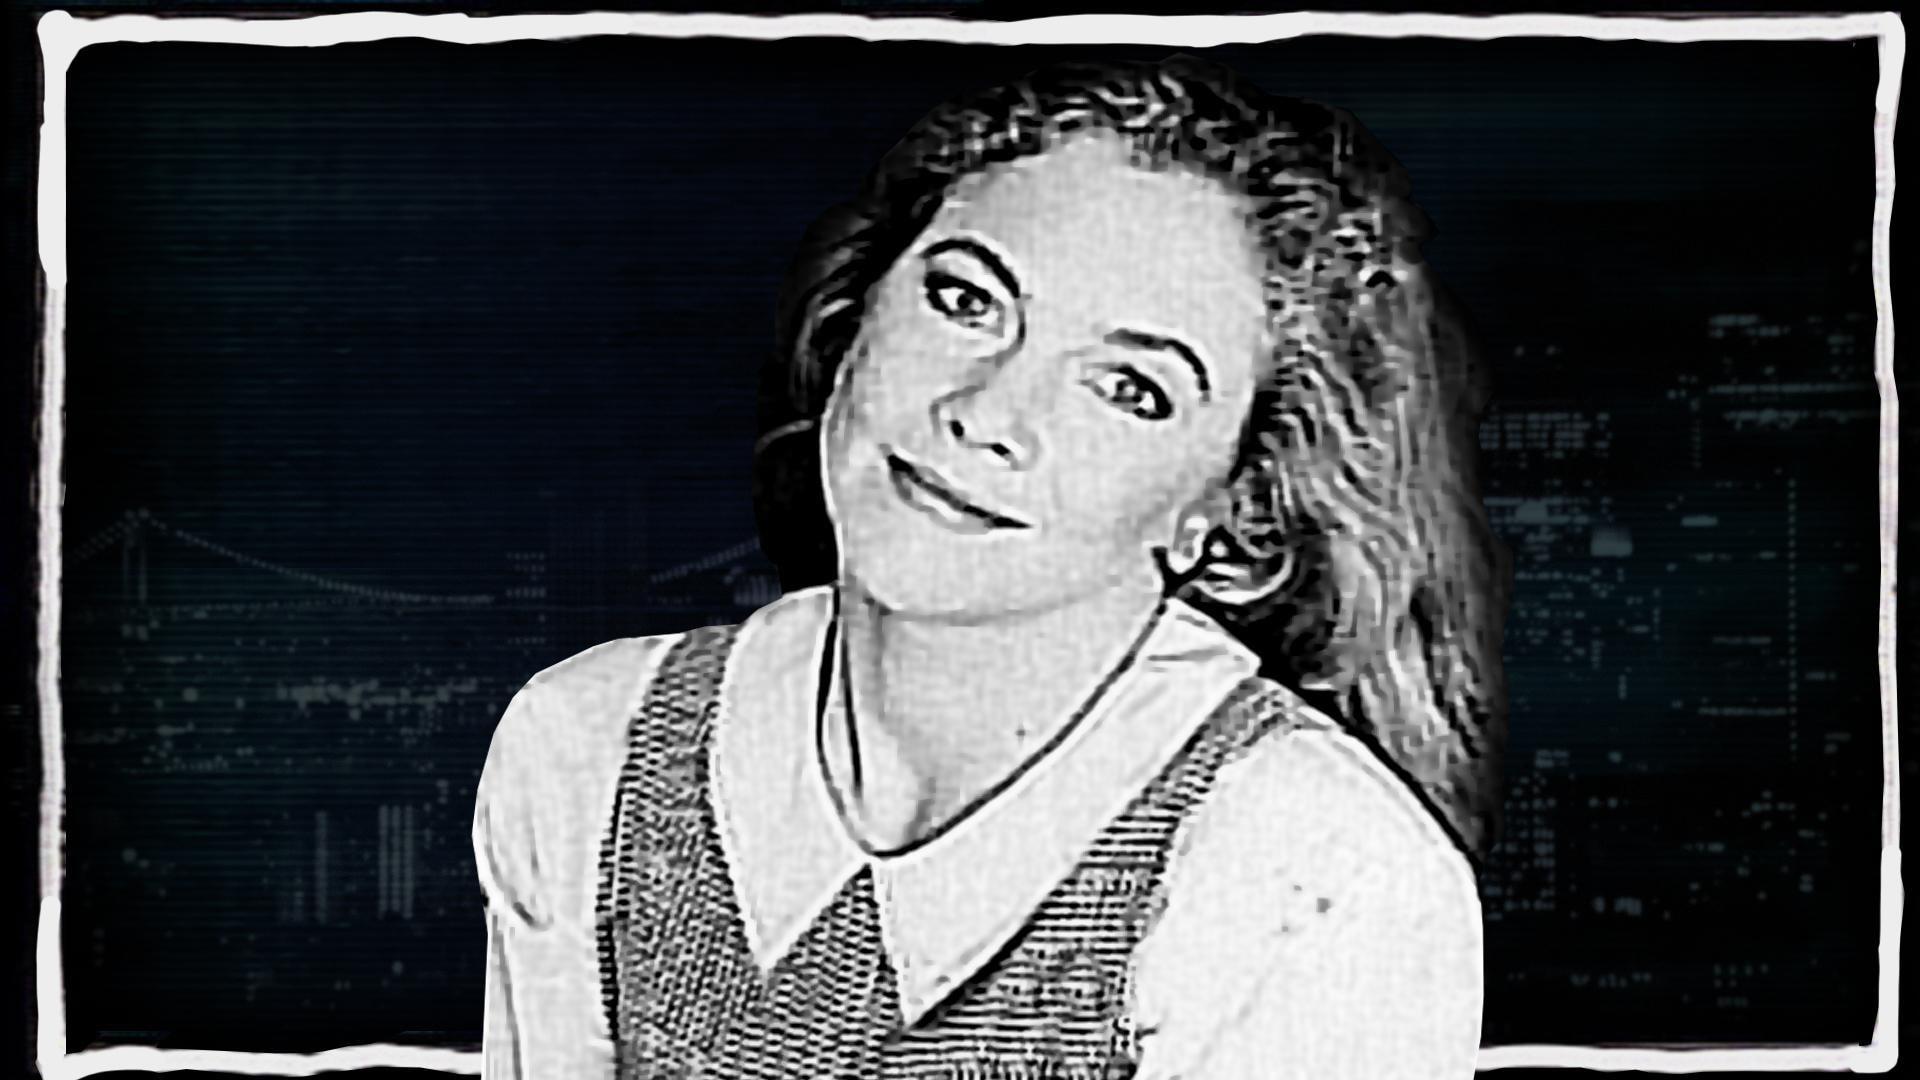 Kathleen Turner: October 21, 1989